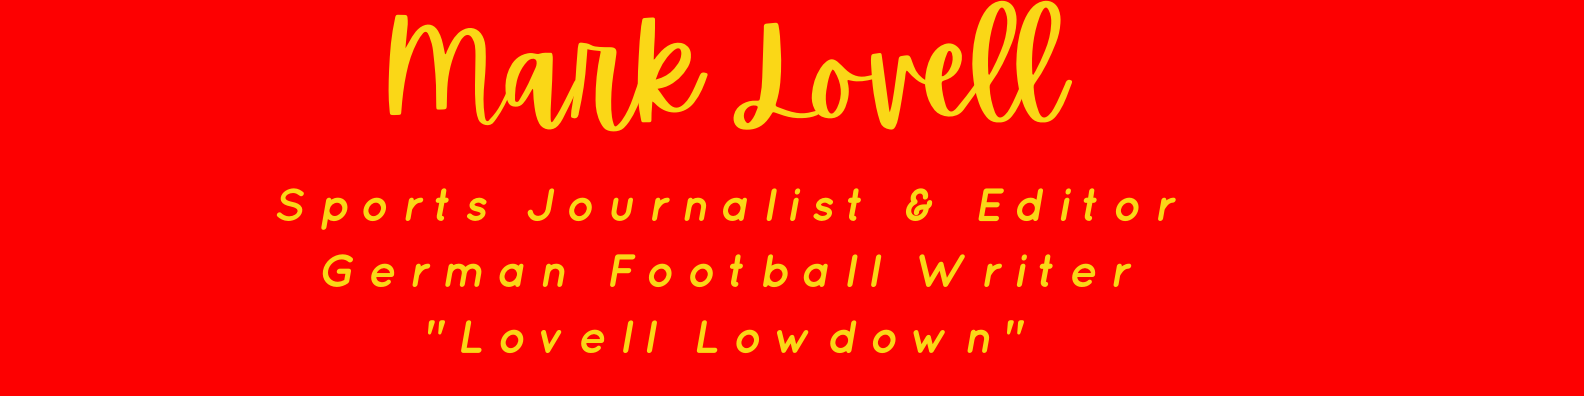 Mark Lovell - German Football Writer / UEFA Accredited Journalist